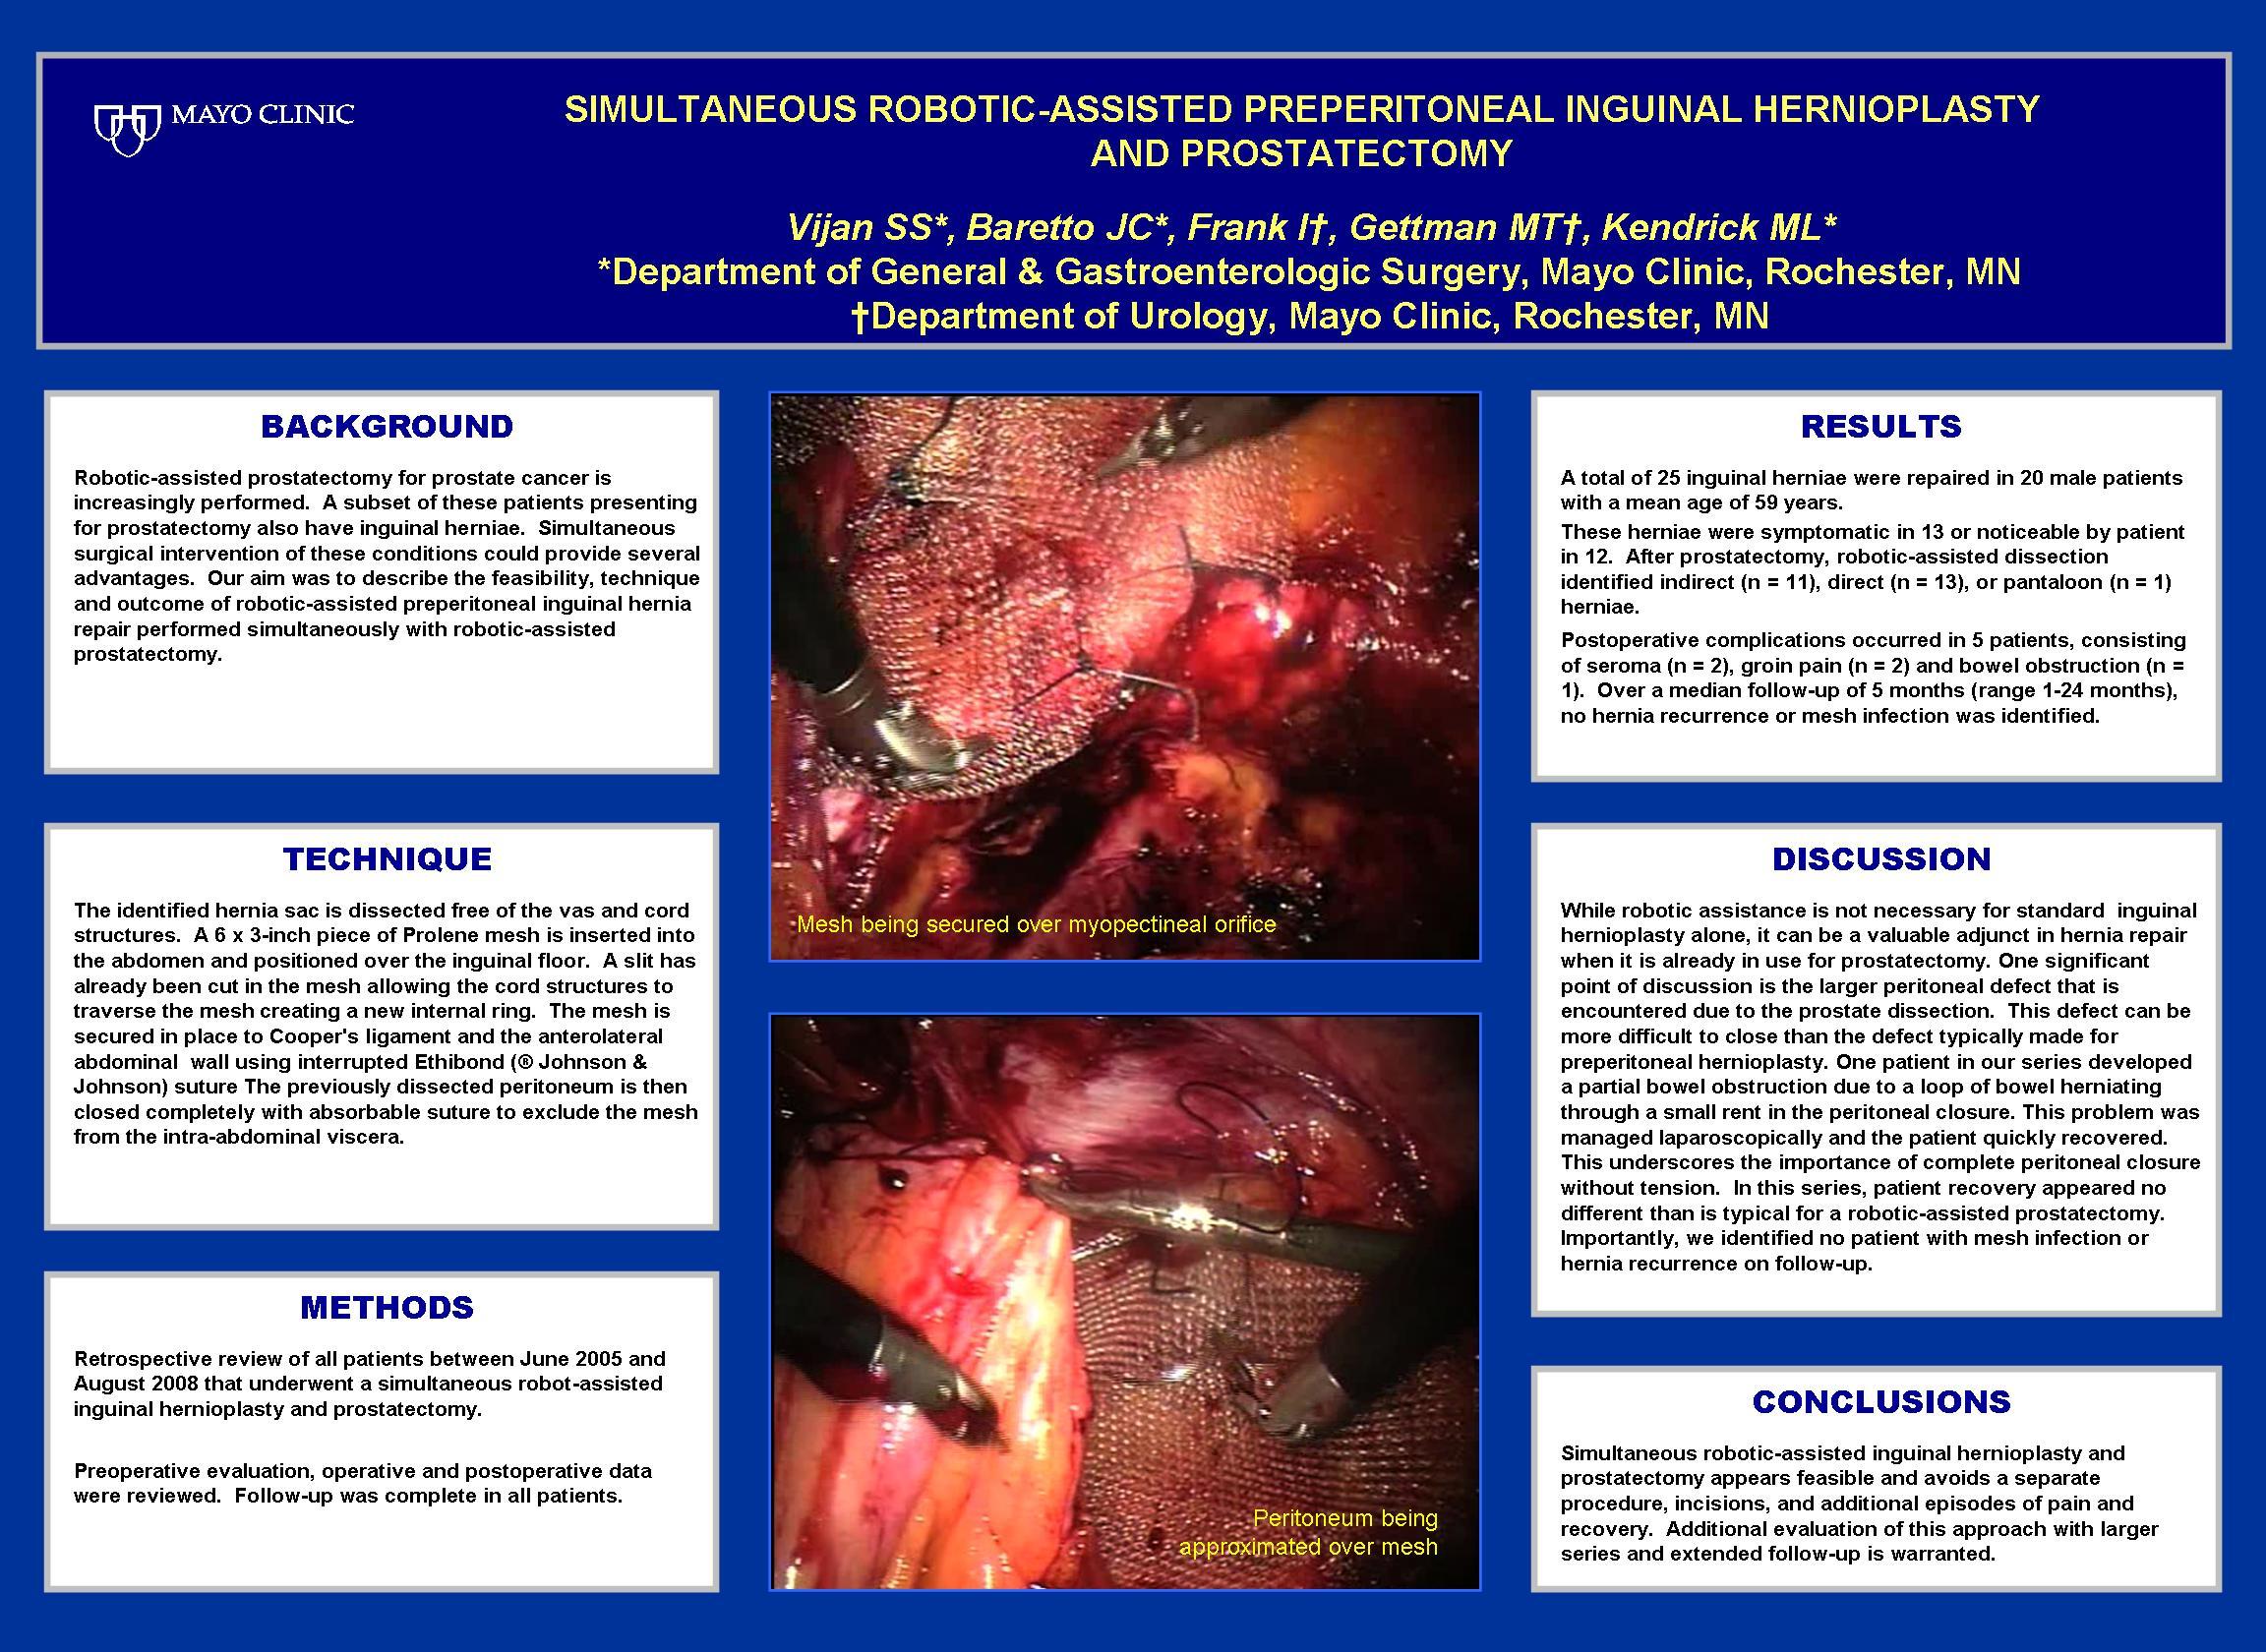 Simultaneous Robotic Assisted Preperitoneal Inguinal Hernioplasty